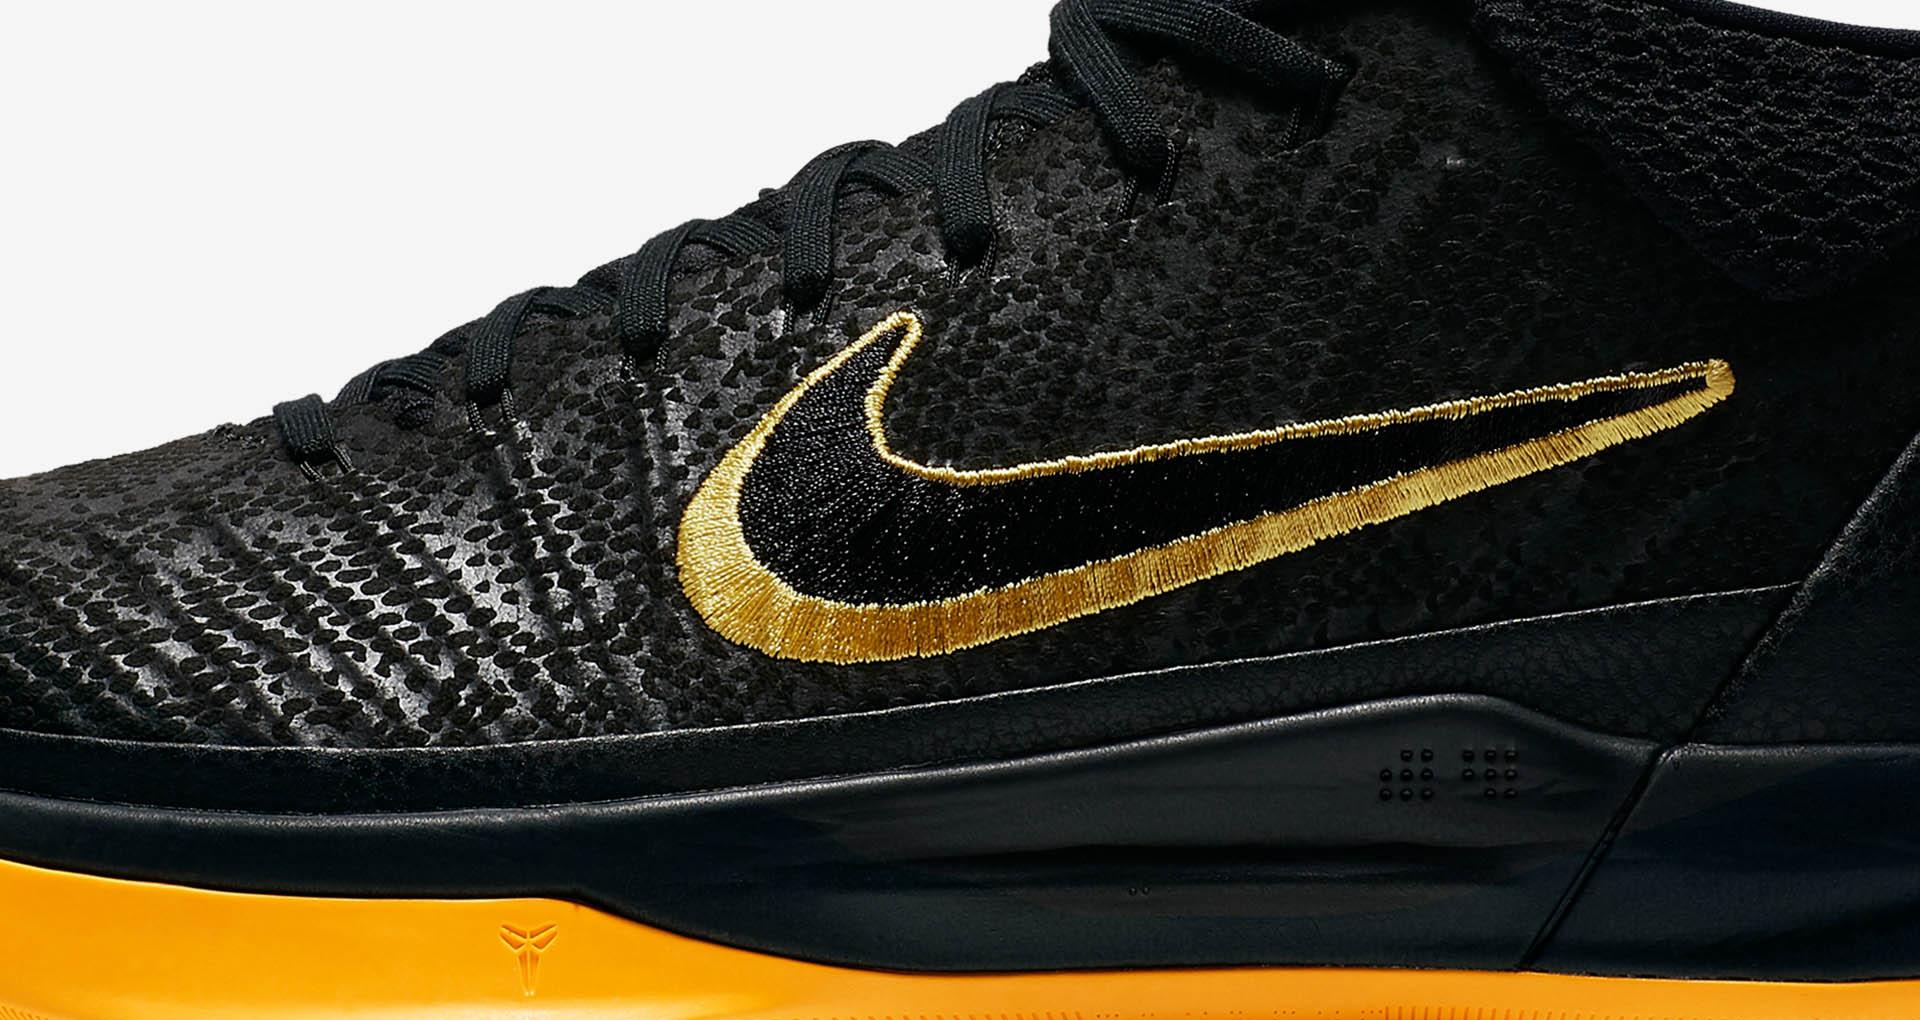 797b1536d72 Basketball   Kicks On Court   Nike   Release Reminder ...